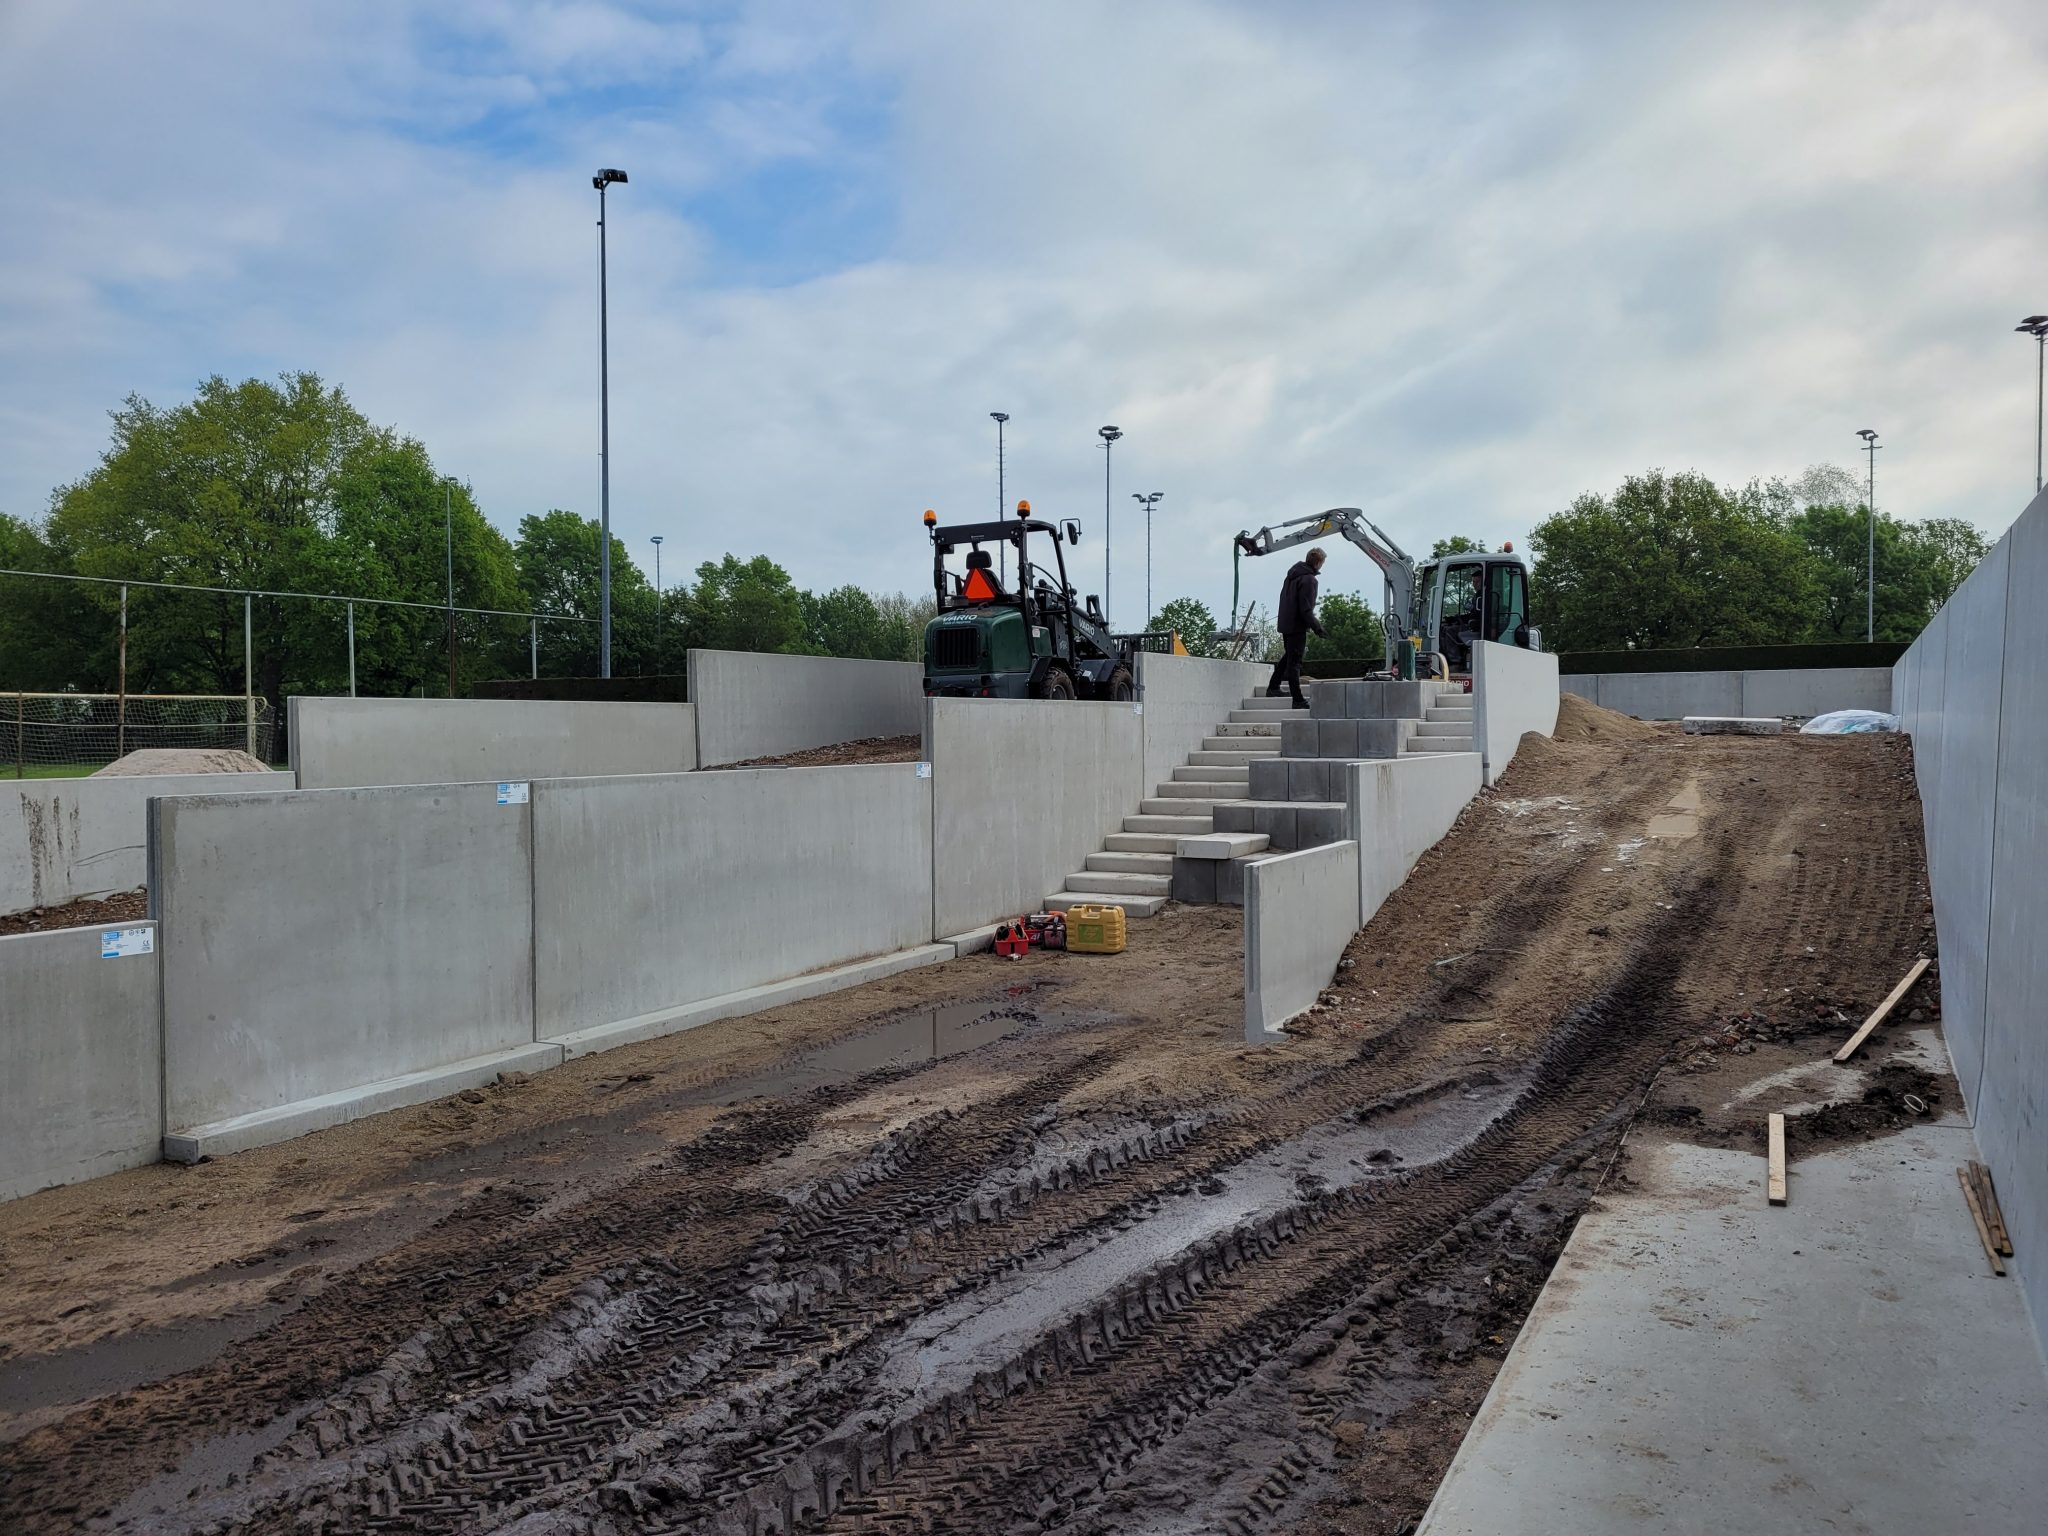 Realisatie Vitaal Sportpark in volle gang